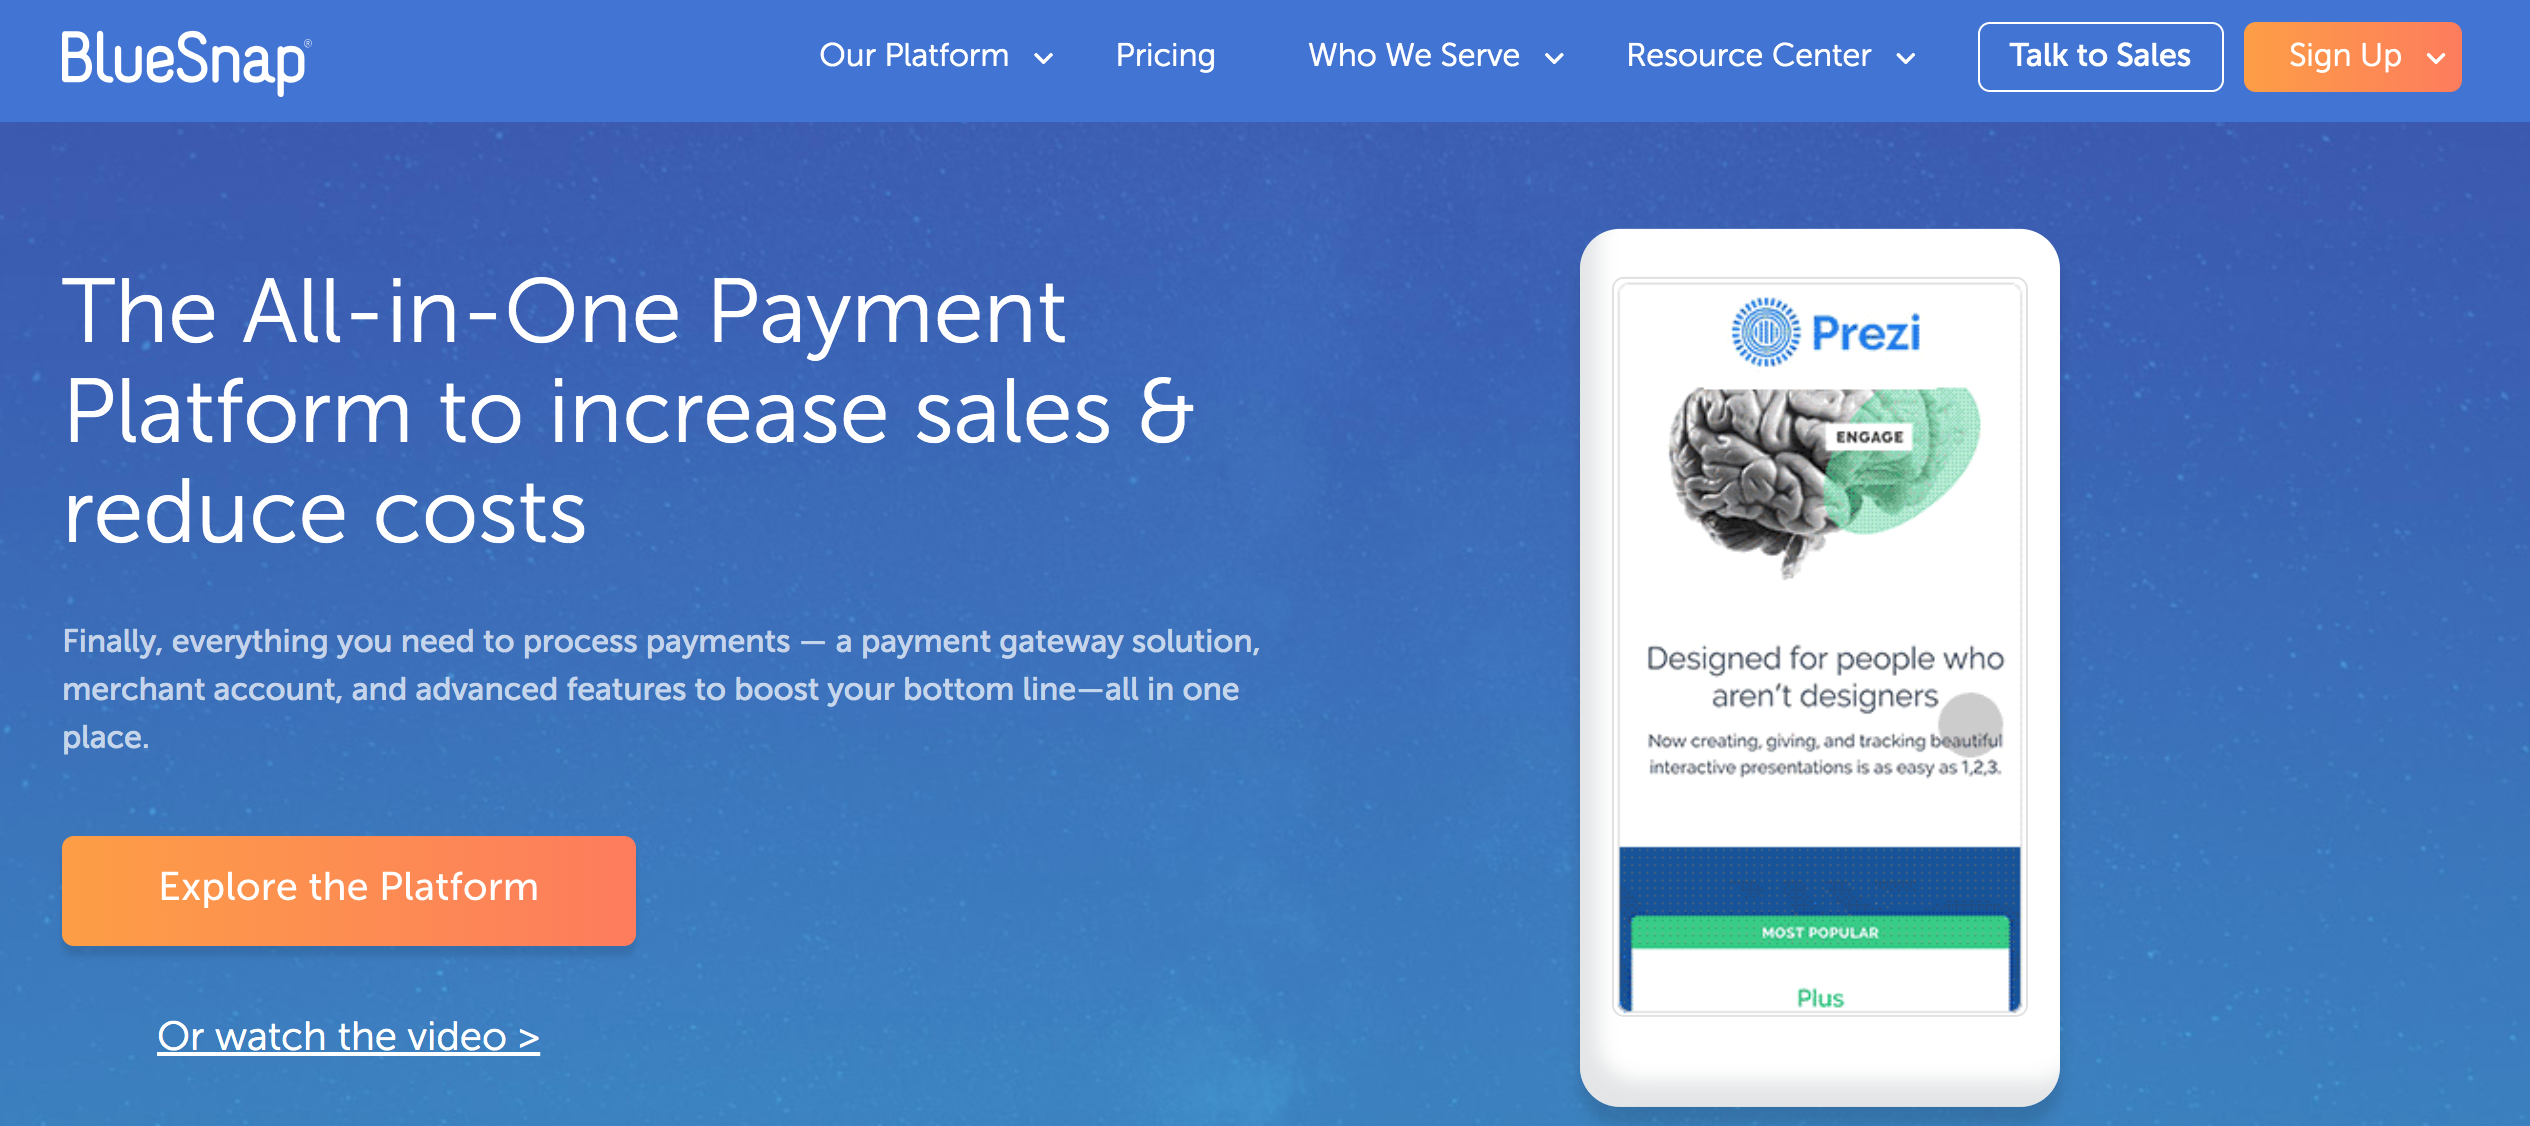 bluesnap financial services website